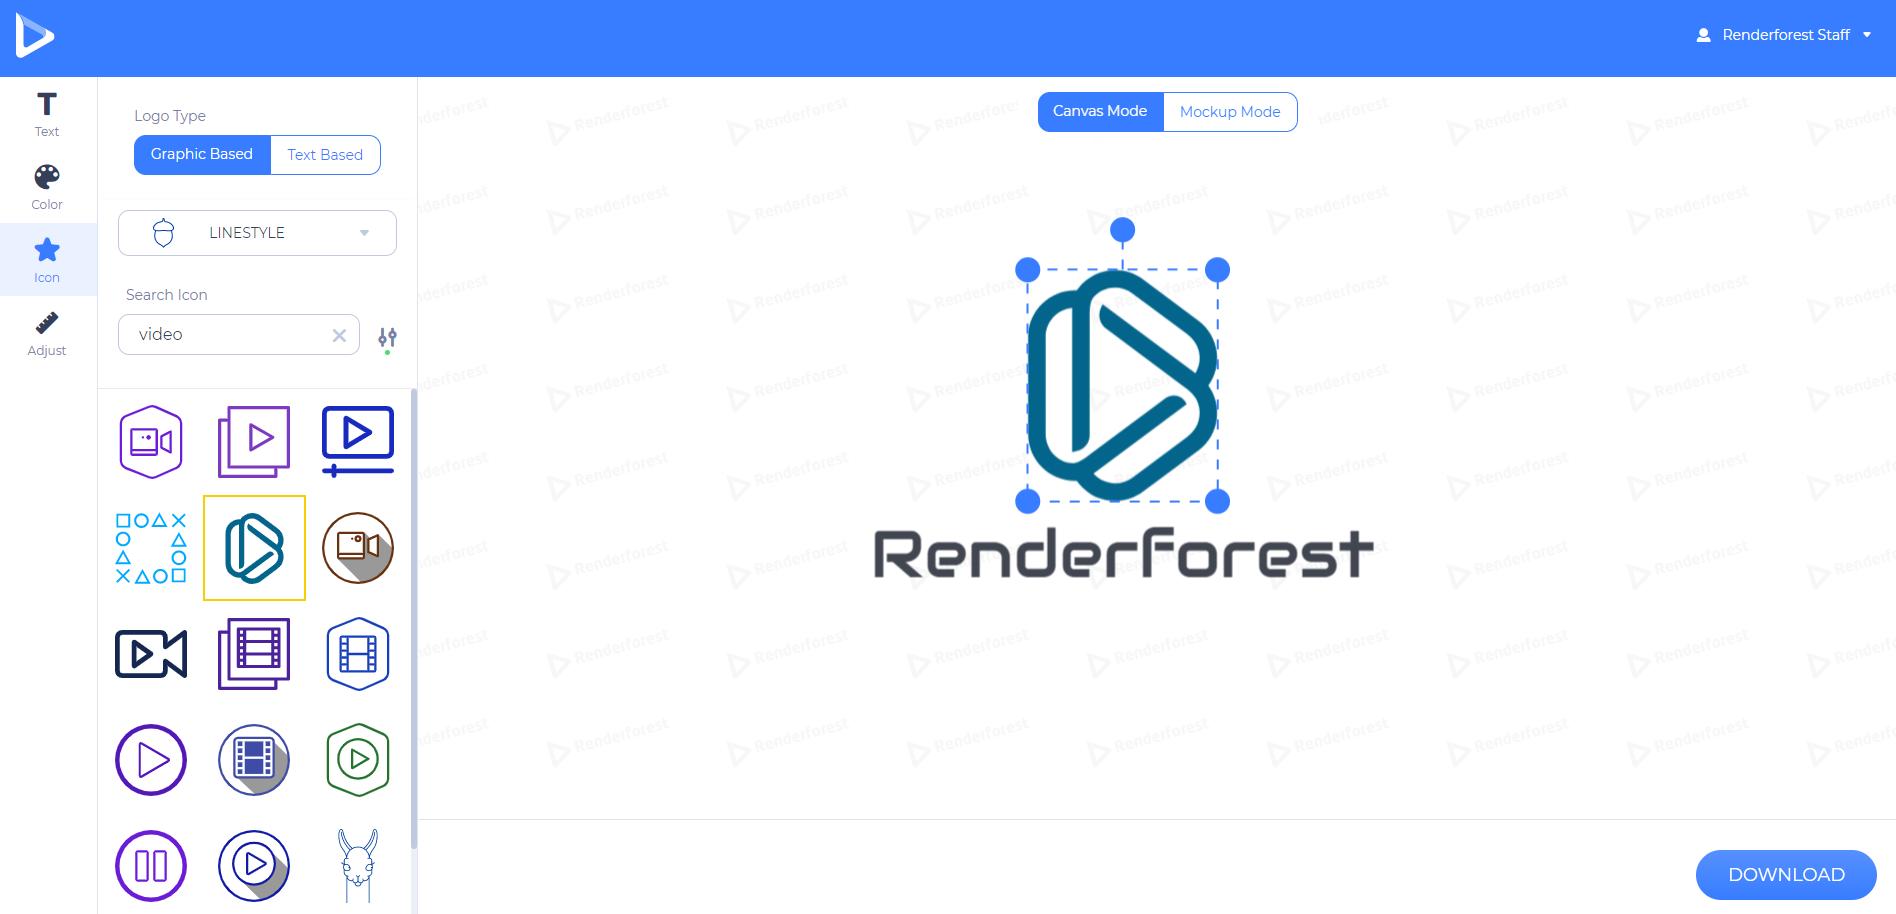 change logo icon